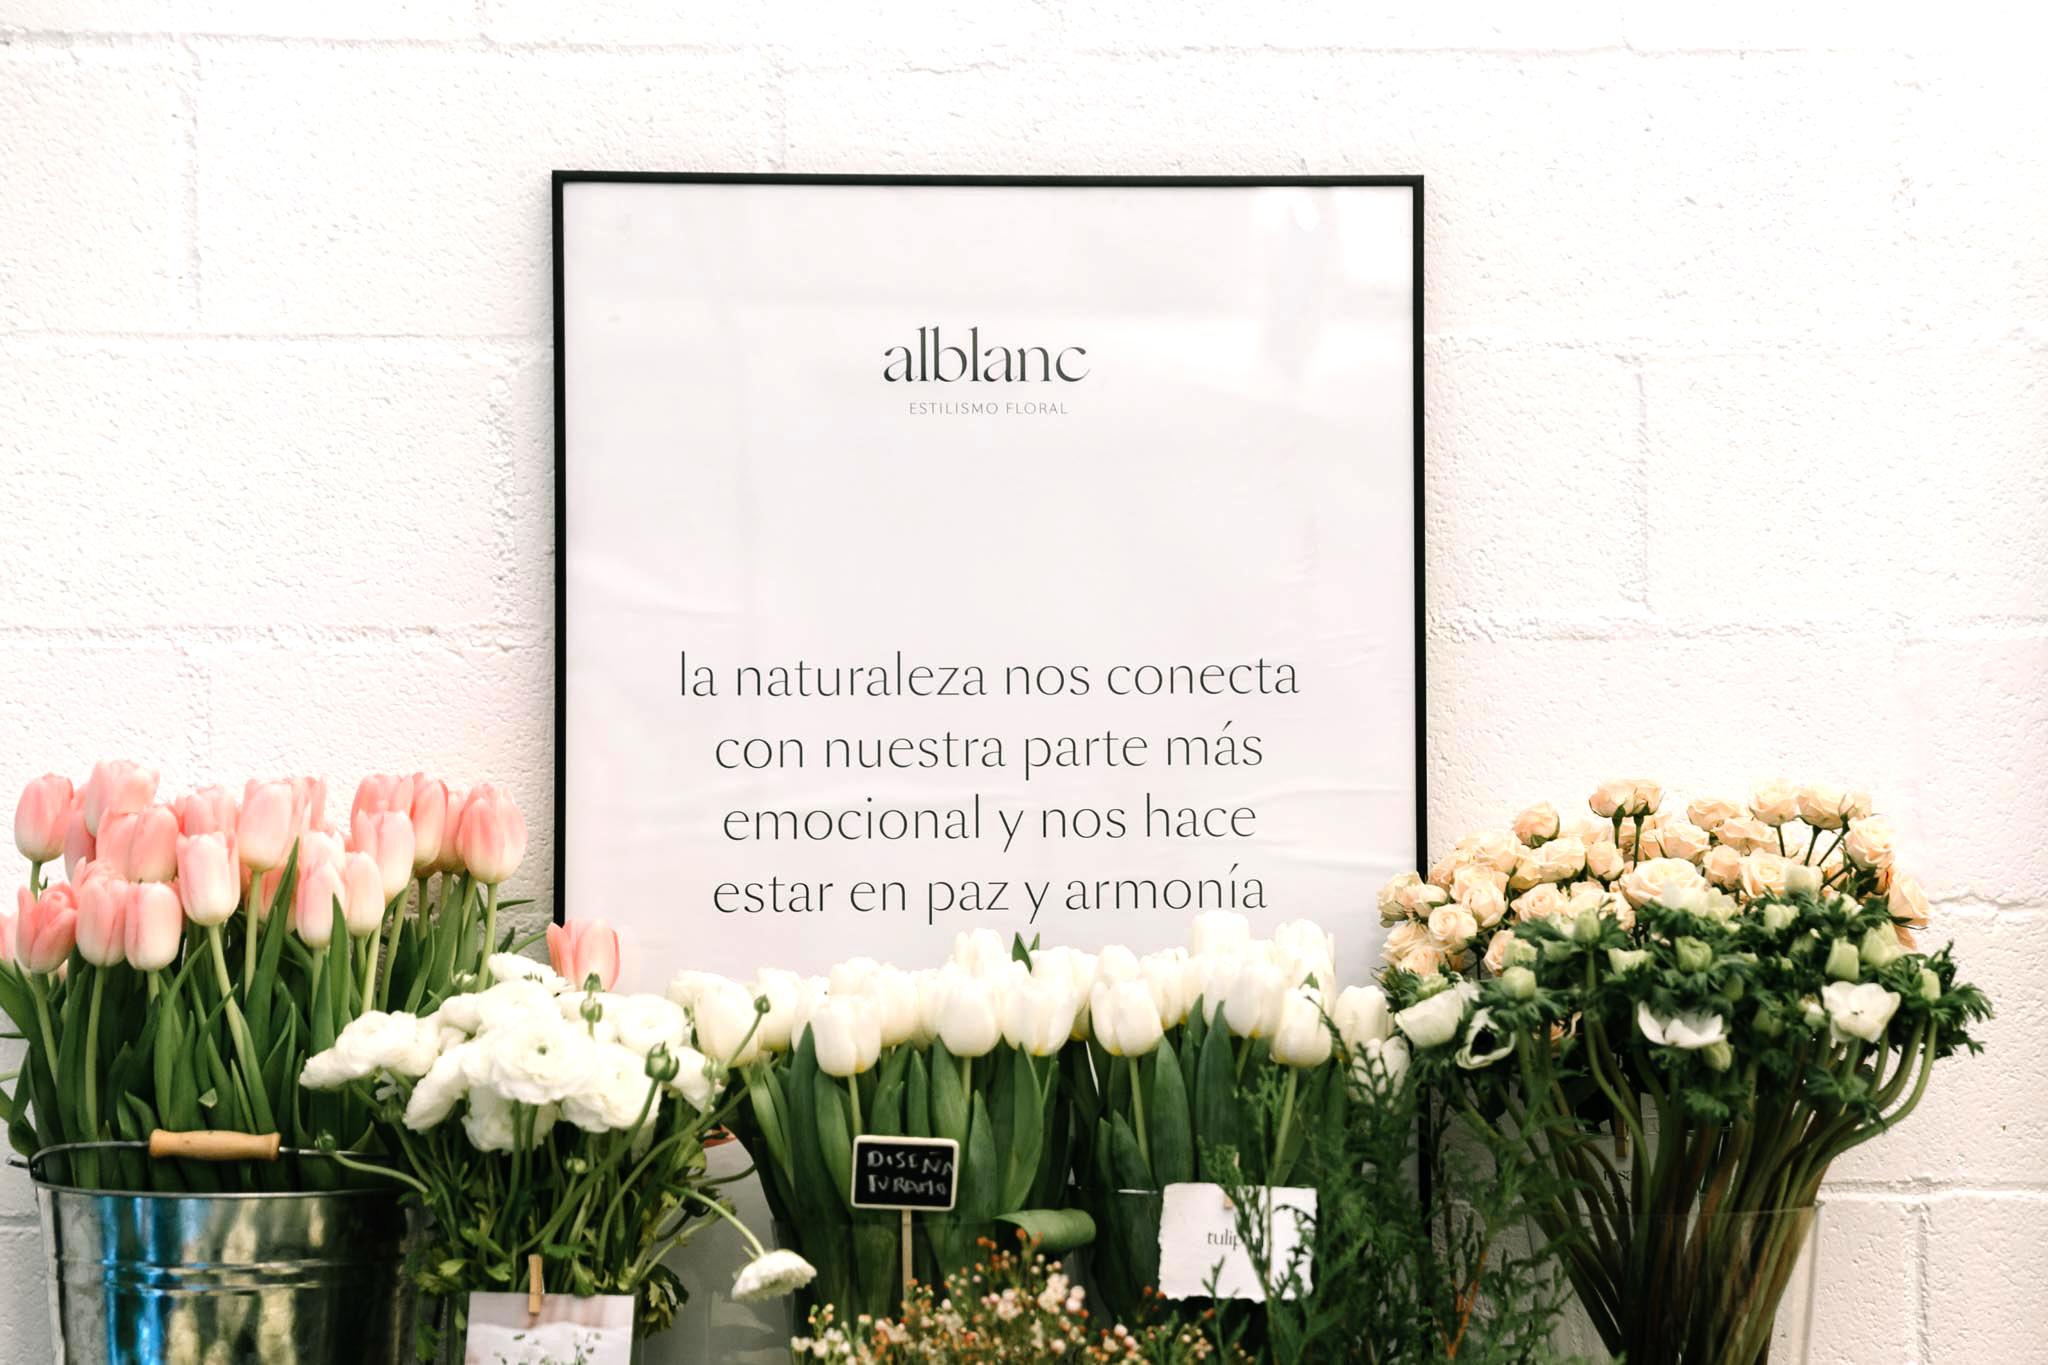 20161217-alblanc-singulares-006-copy.jpg